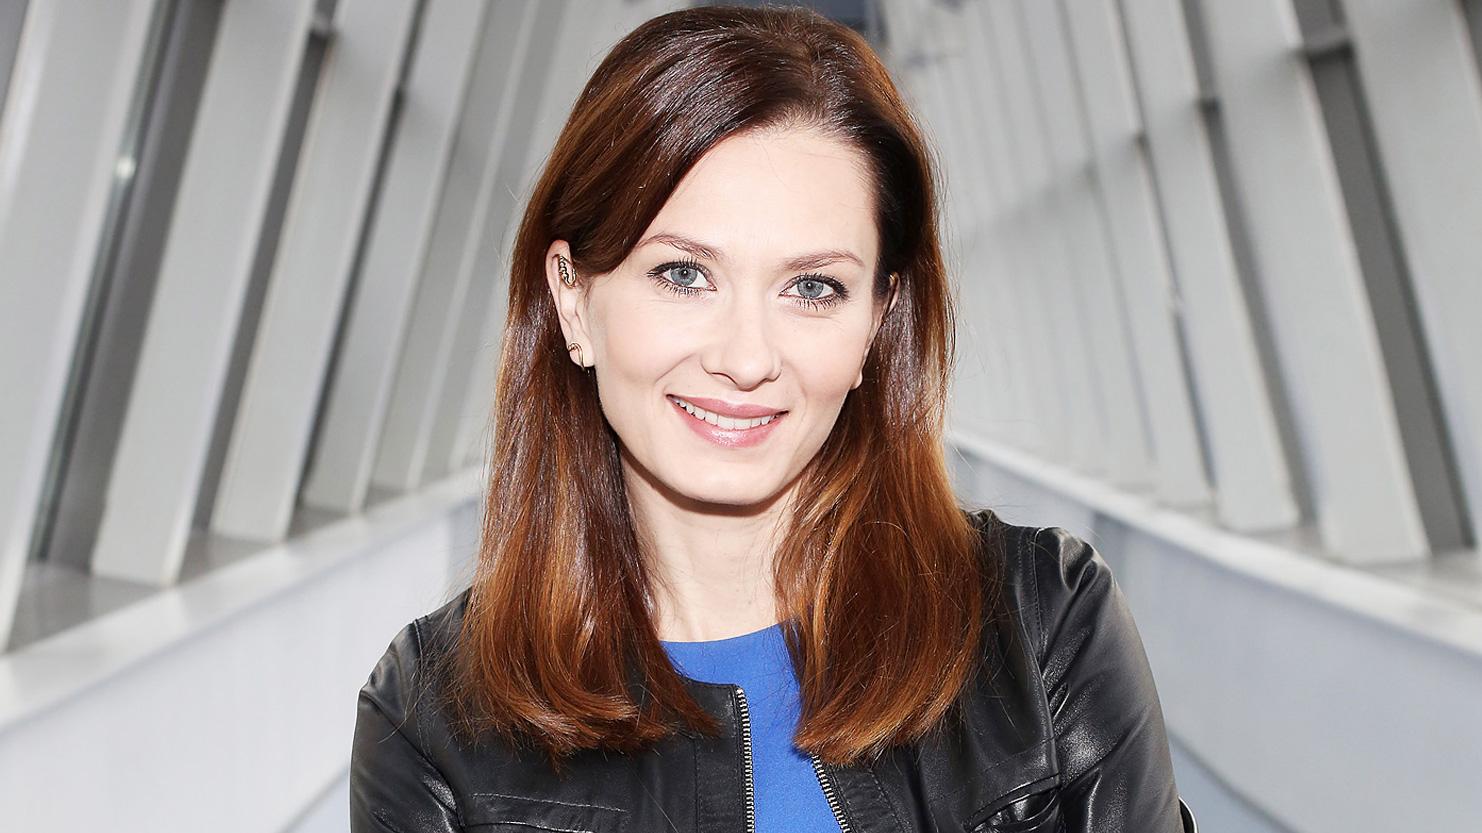 Anita Sokołowska: Nie muszę nic udowadniać - Polsat.pl